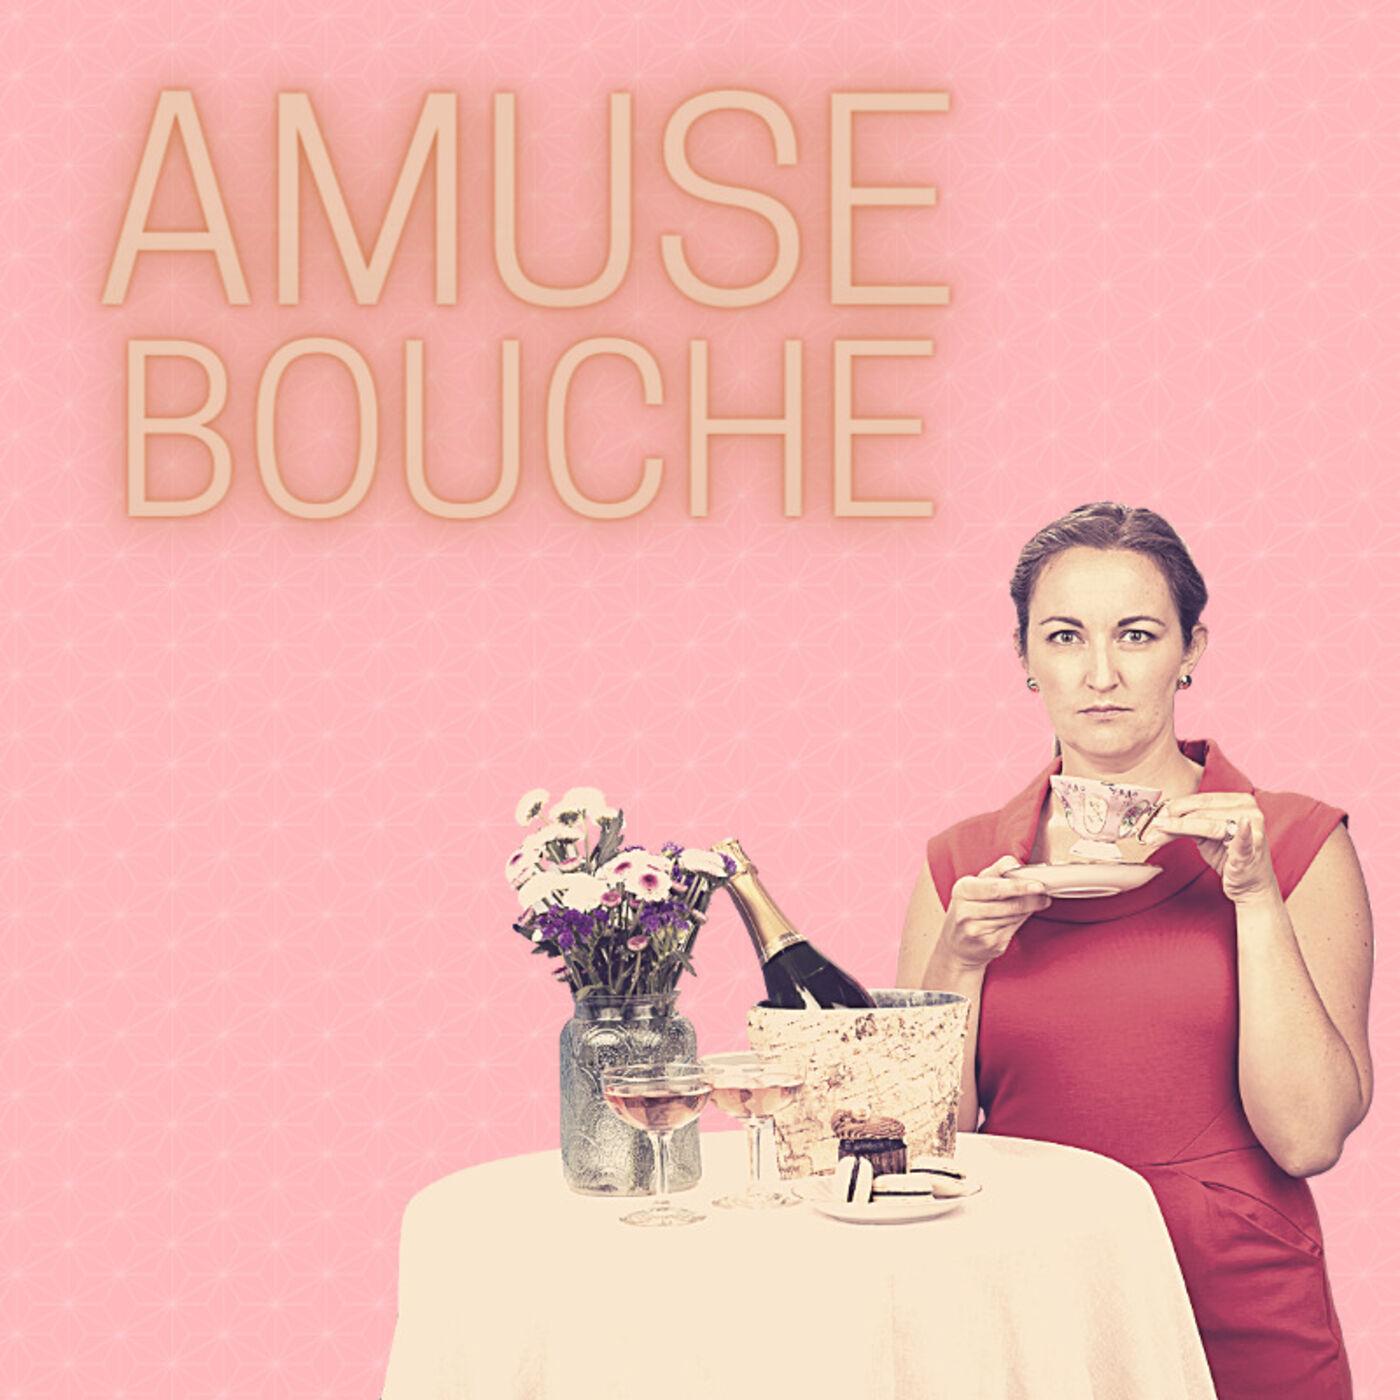 Thrift Store Finds - Amuse Bouche #9